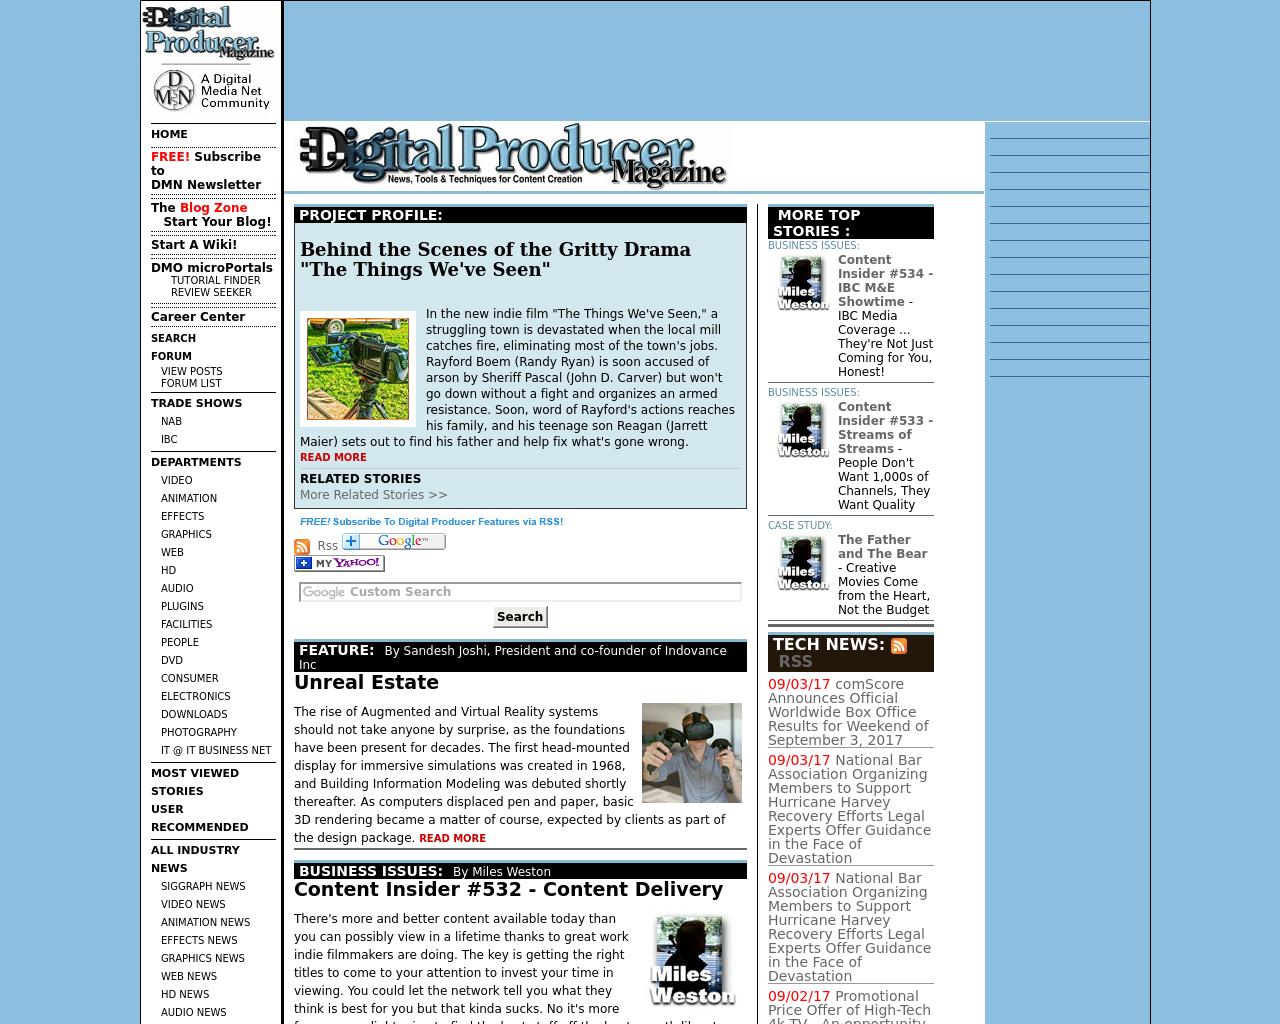 Digital-Media-NET-Advertising-Reviews-Pricing